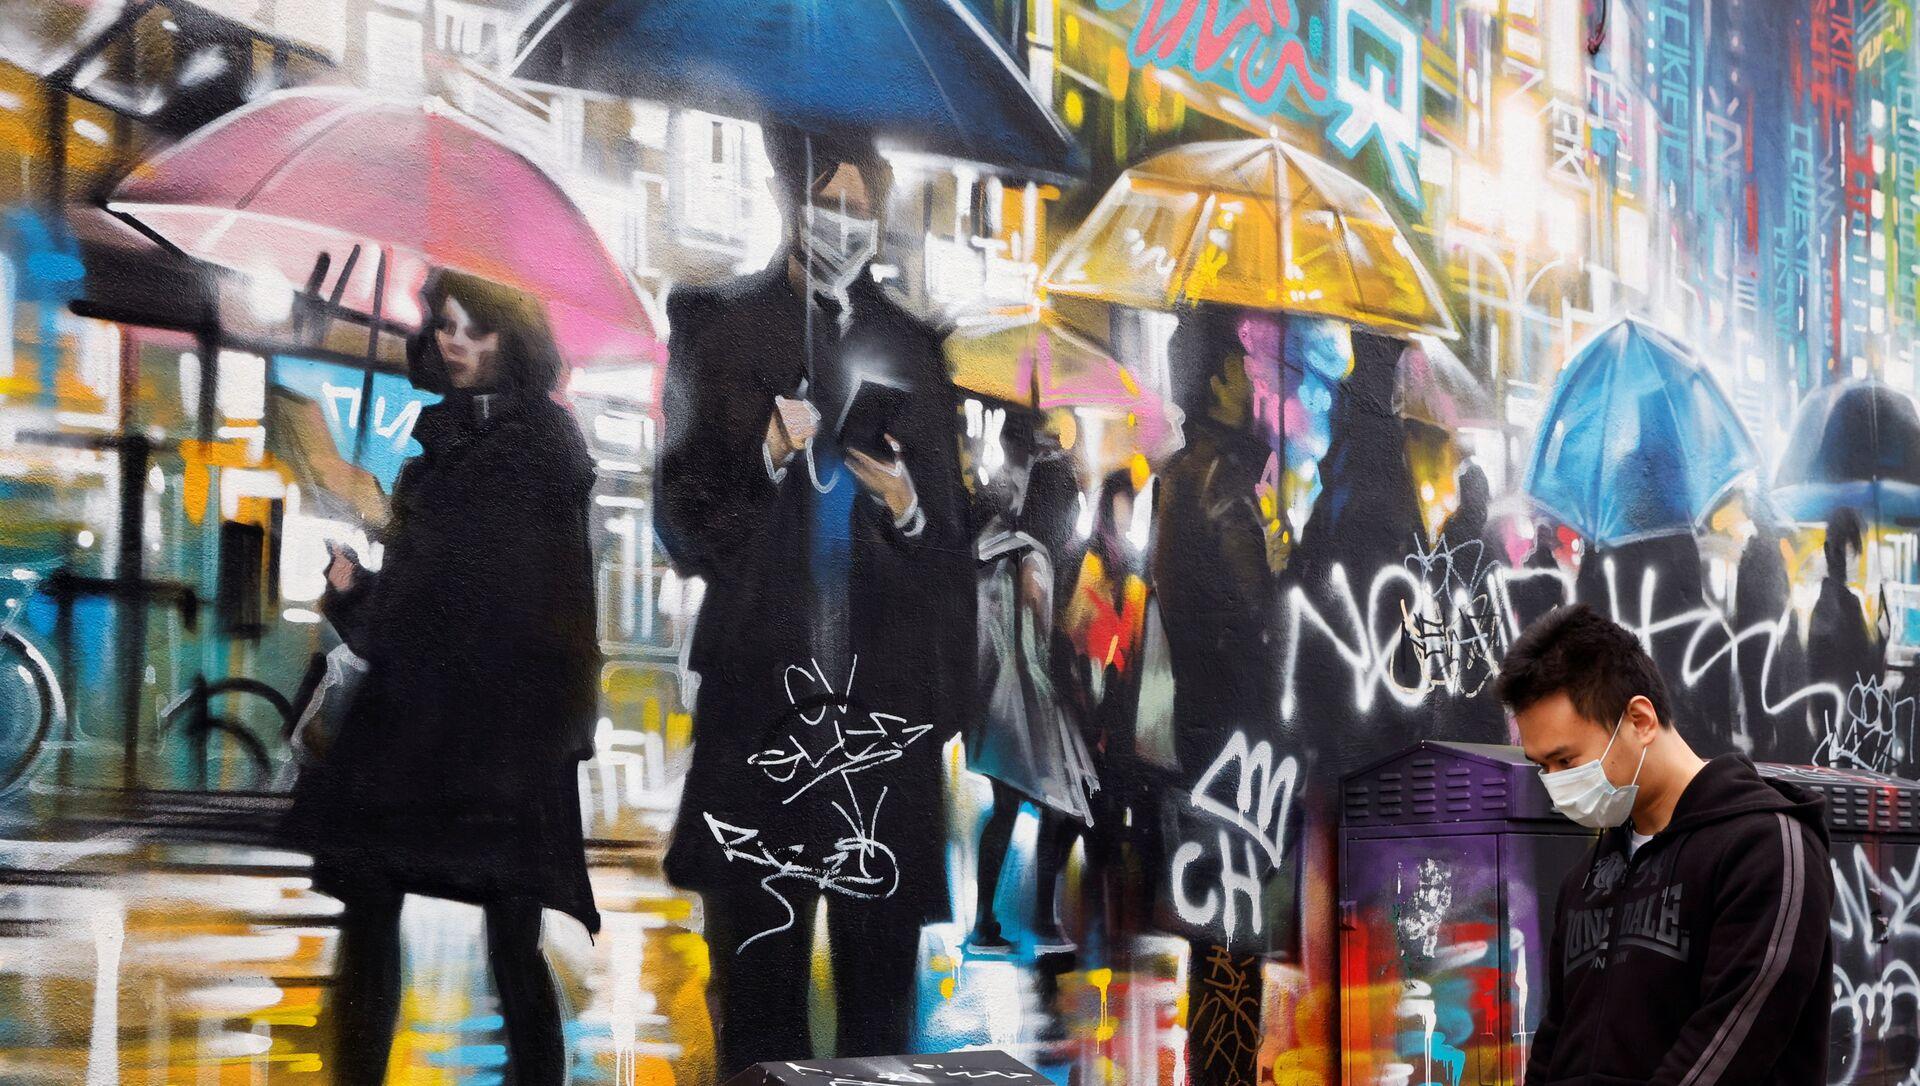 A man wearing a face mask walks past graffiti, amid the outbreak of the coronavirus disease (COVID-19) in London, Britain January 19, 2021 - Sputnik Polska, 1920, 16.02.2021